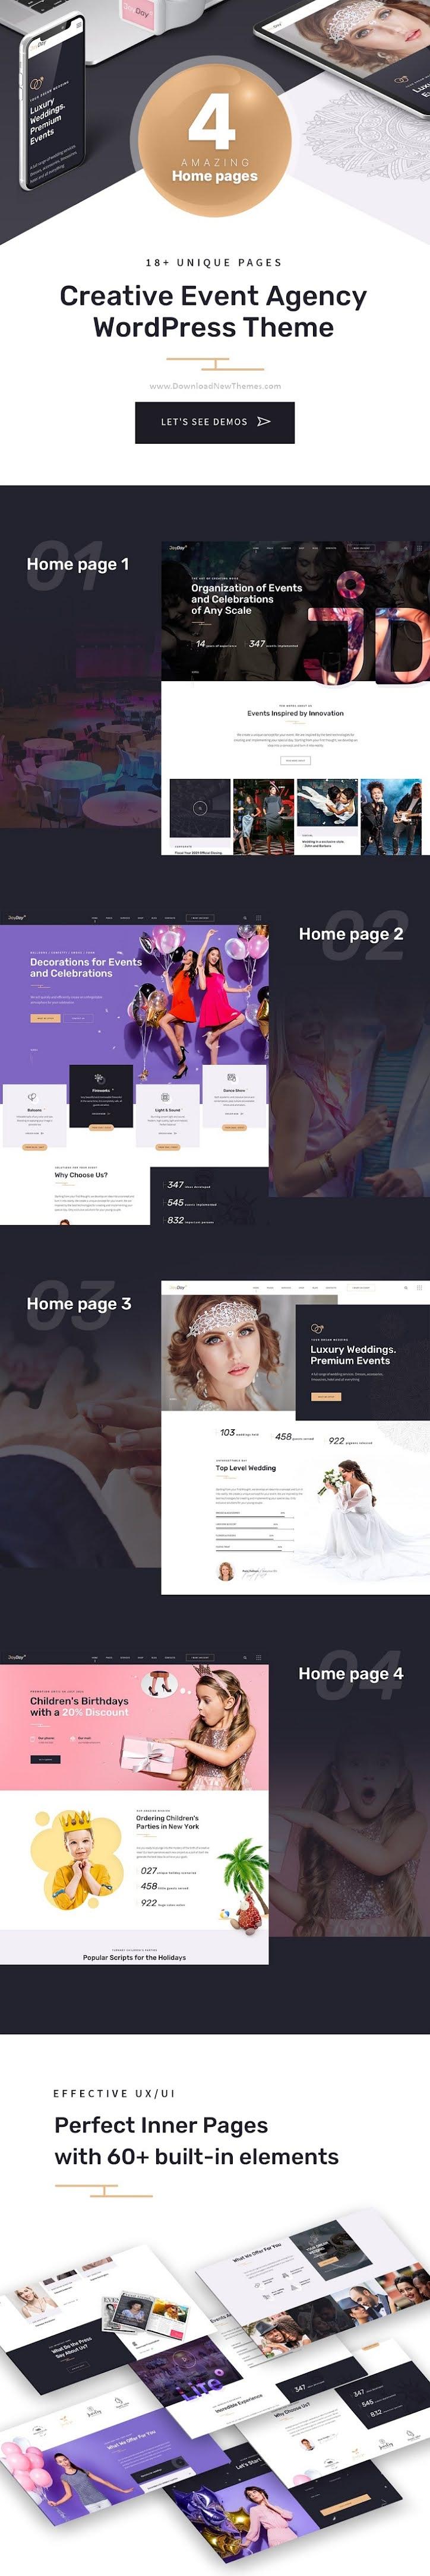 Creative Event Agency WordPress Theme